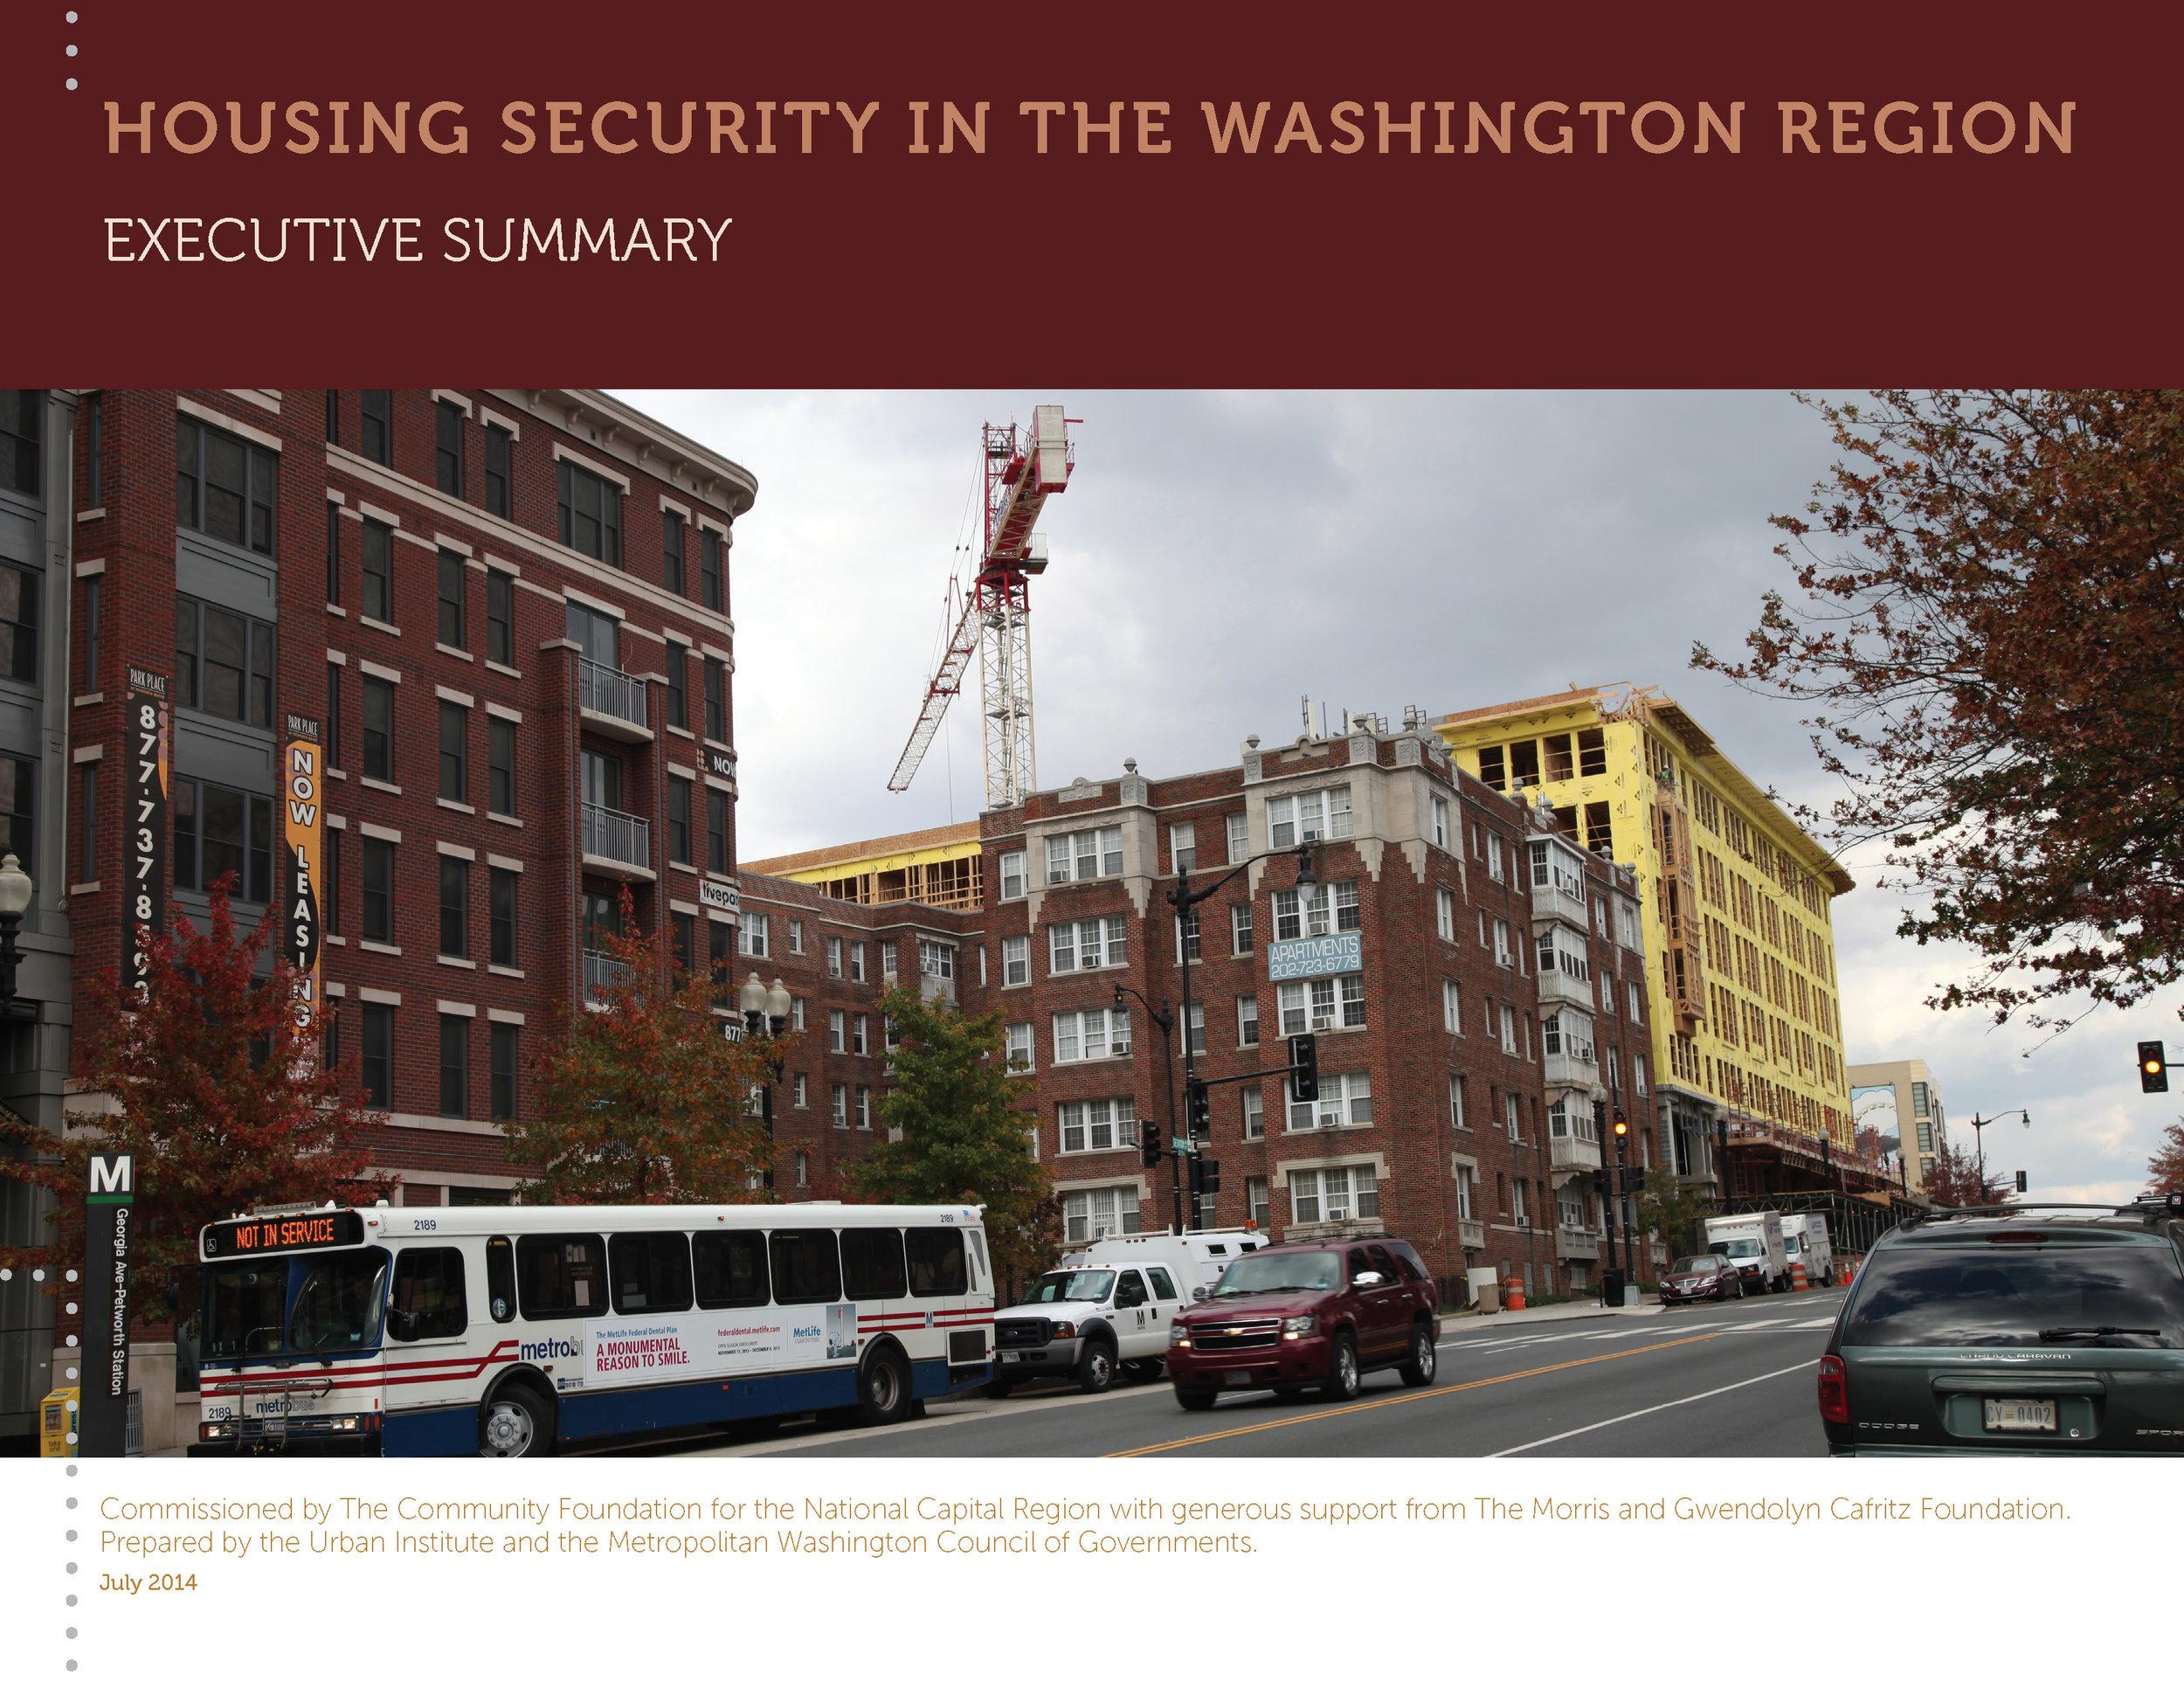 Housing Security in the Washington Region (Executive Summary)